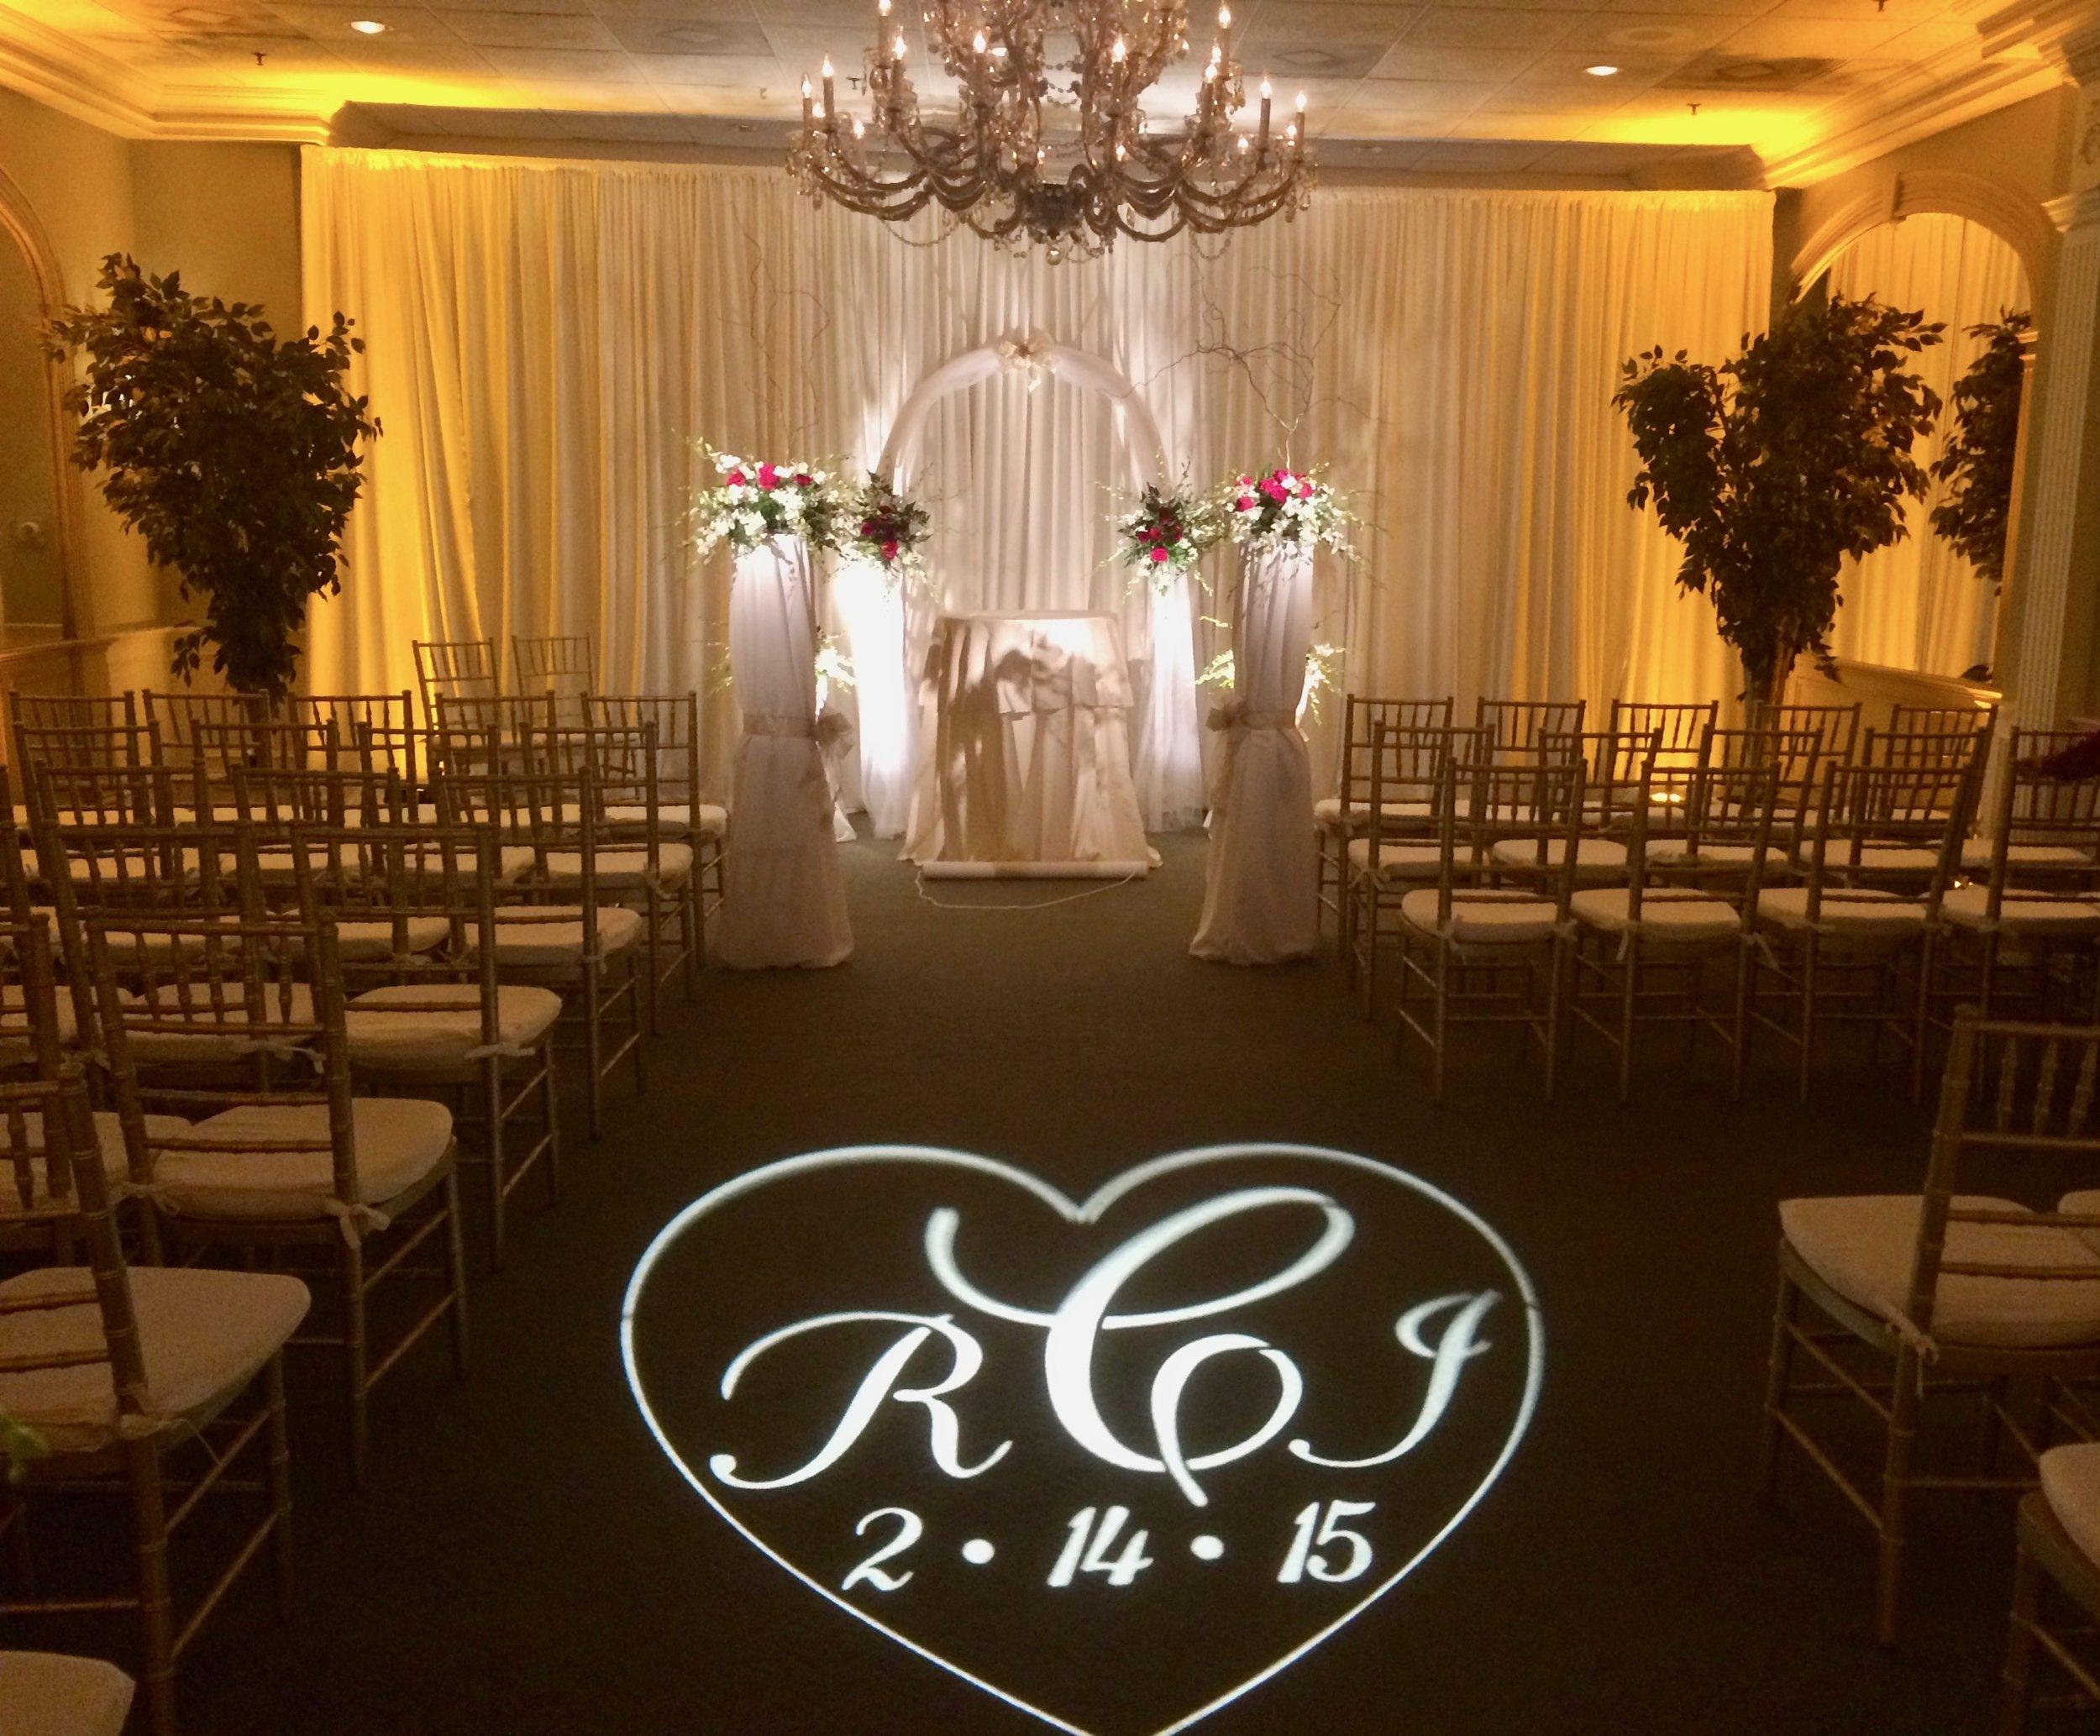 NJ+event+design+decor+lighting+Eggsotic+events+wedding+gobo+custom+lights+PA+NY+NYC.jpeg